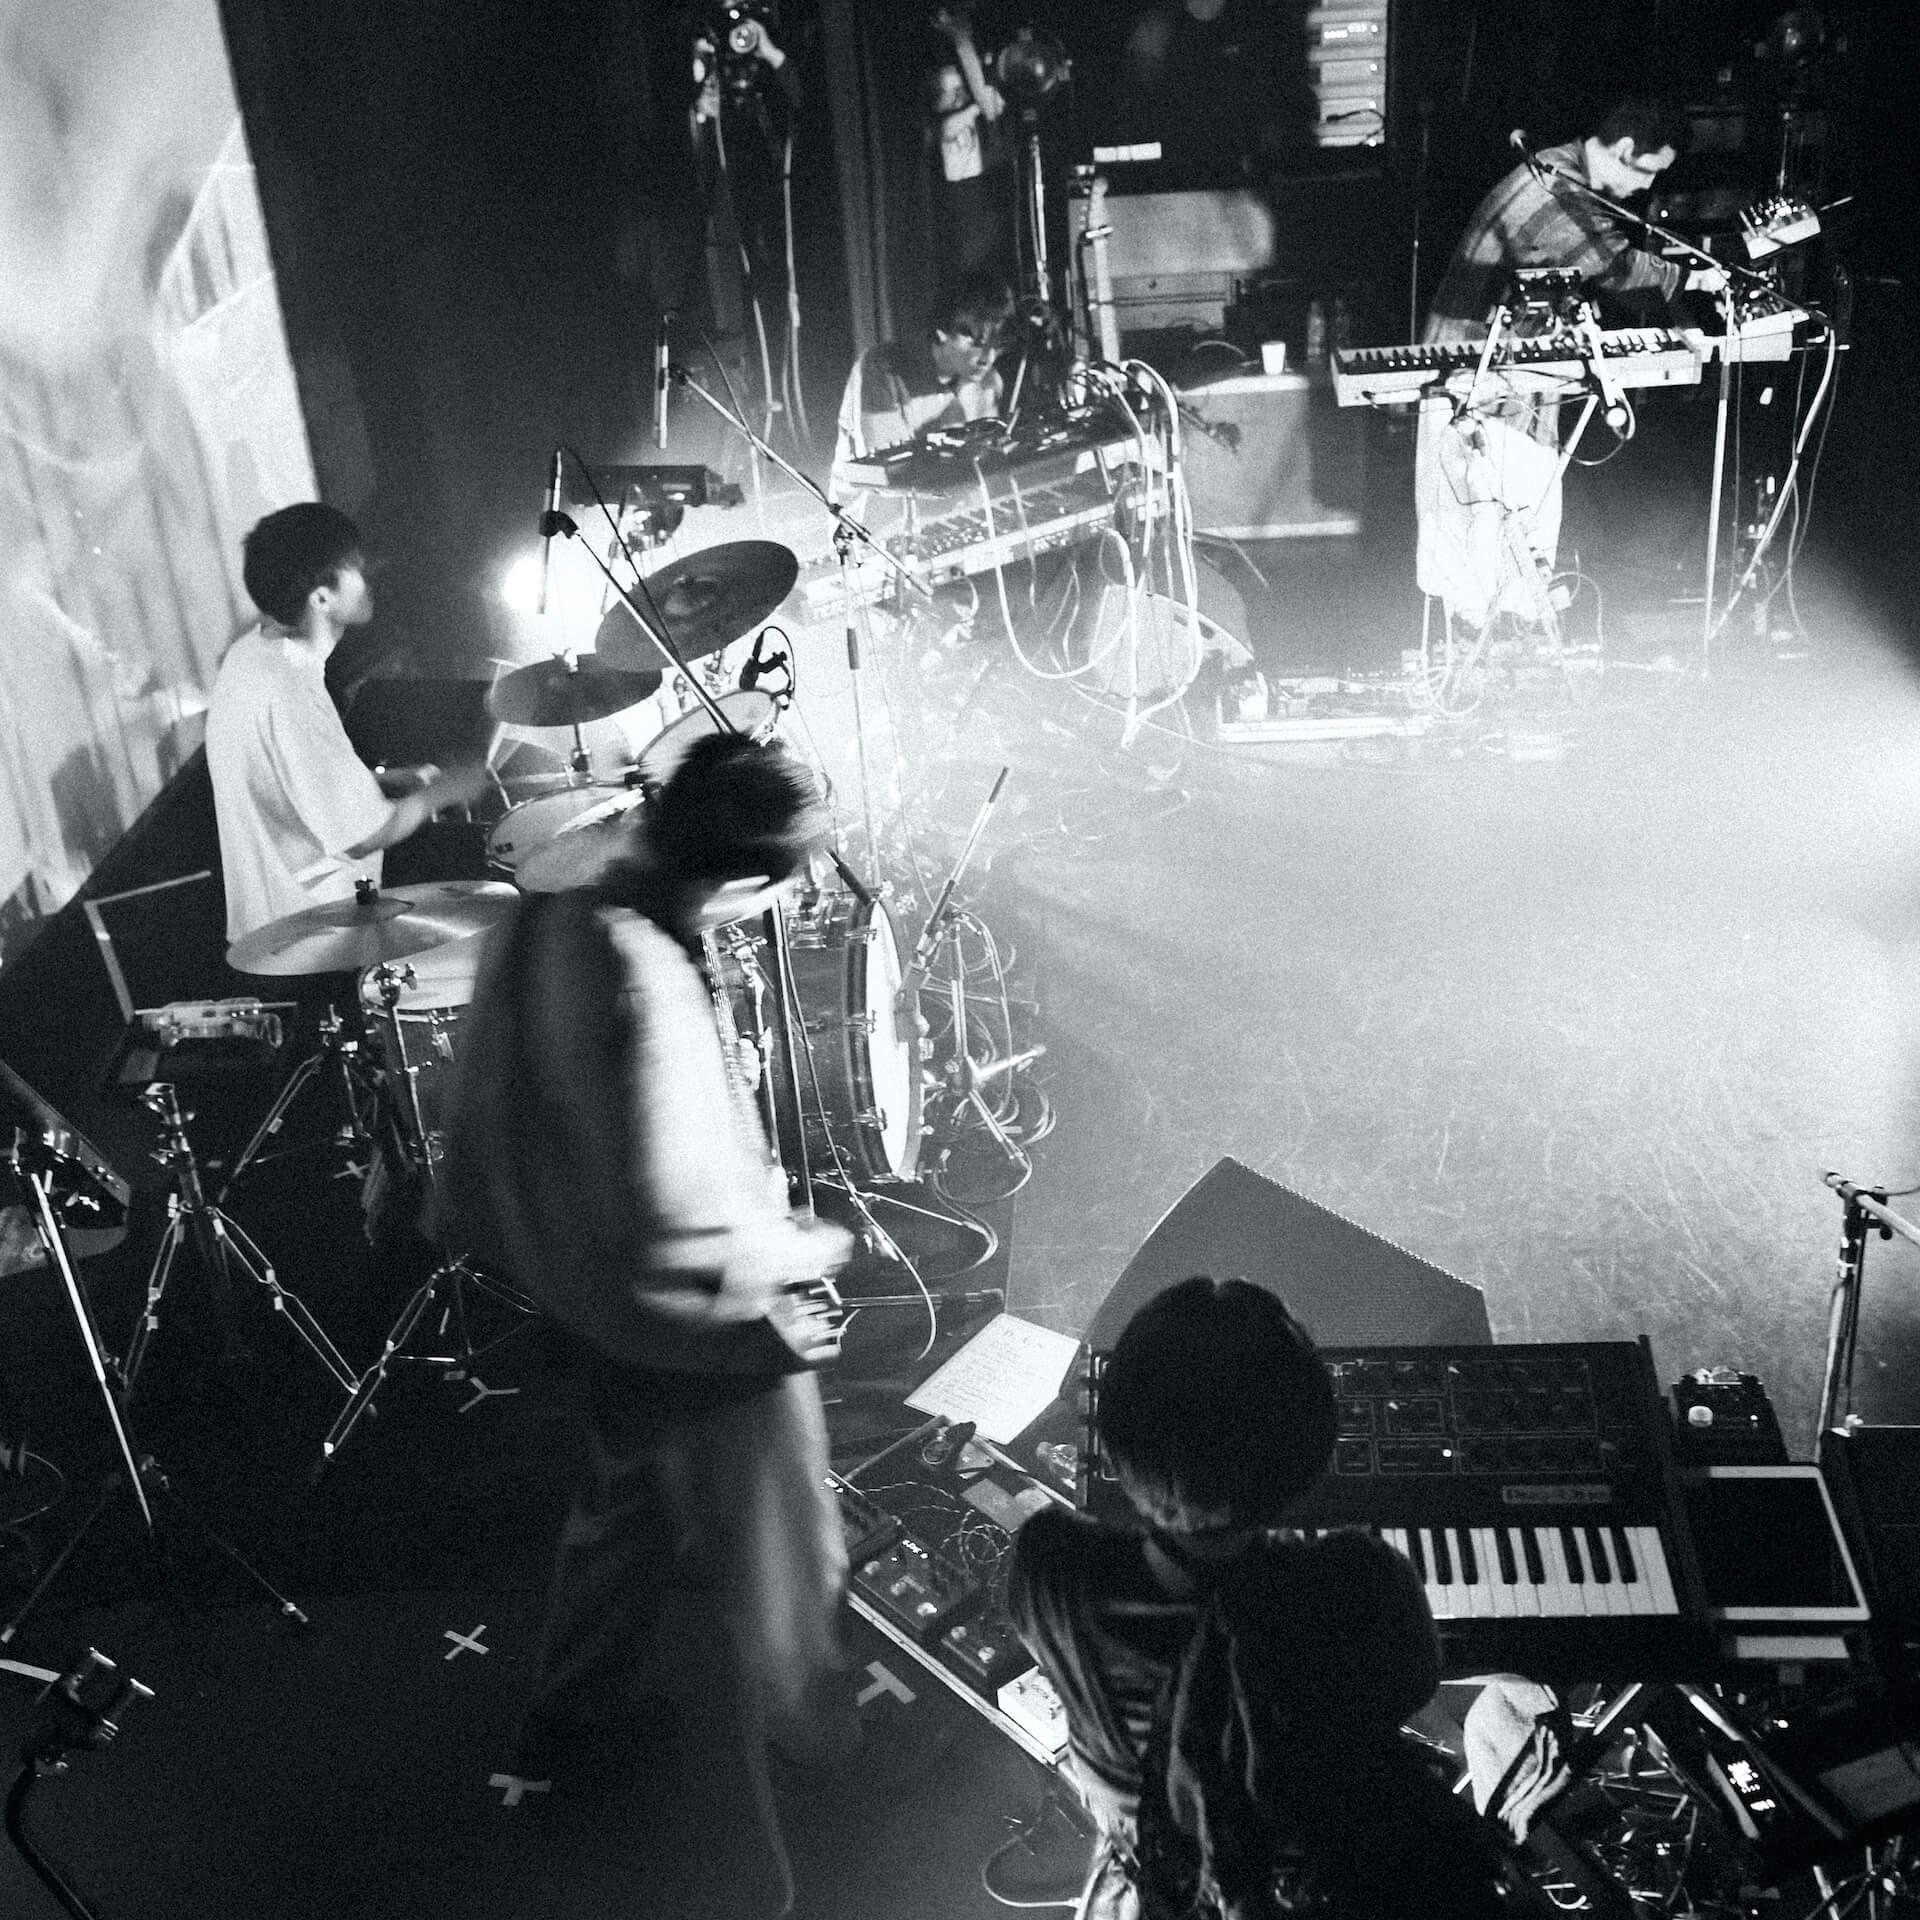 D.A.N.、2020年10月7日のライブ模様を収めたアルバム『LIVE ARCHIVE:STRAND』を配信限定でリリース music201224-dan-stand-1